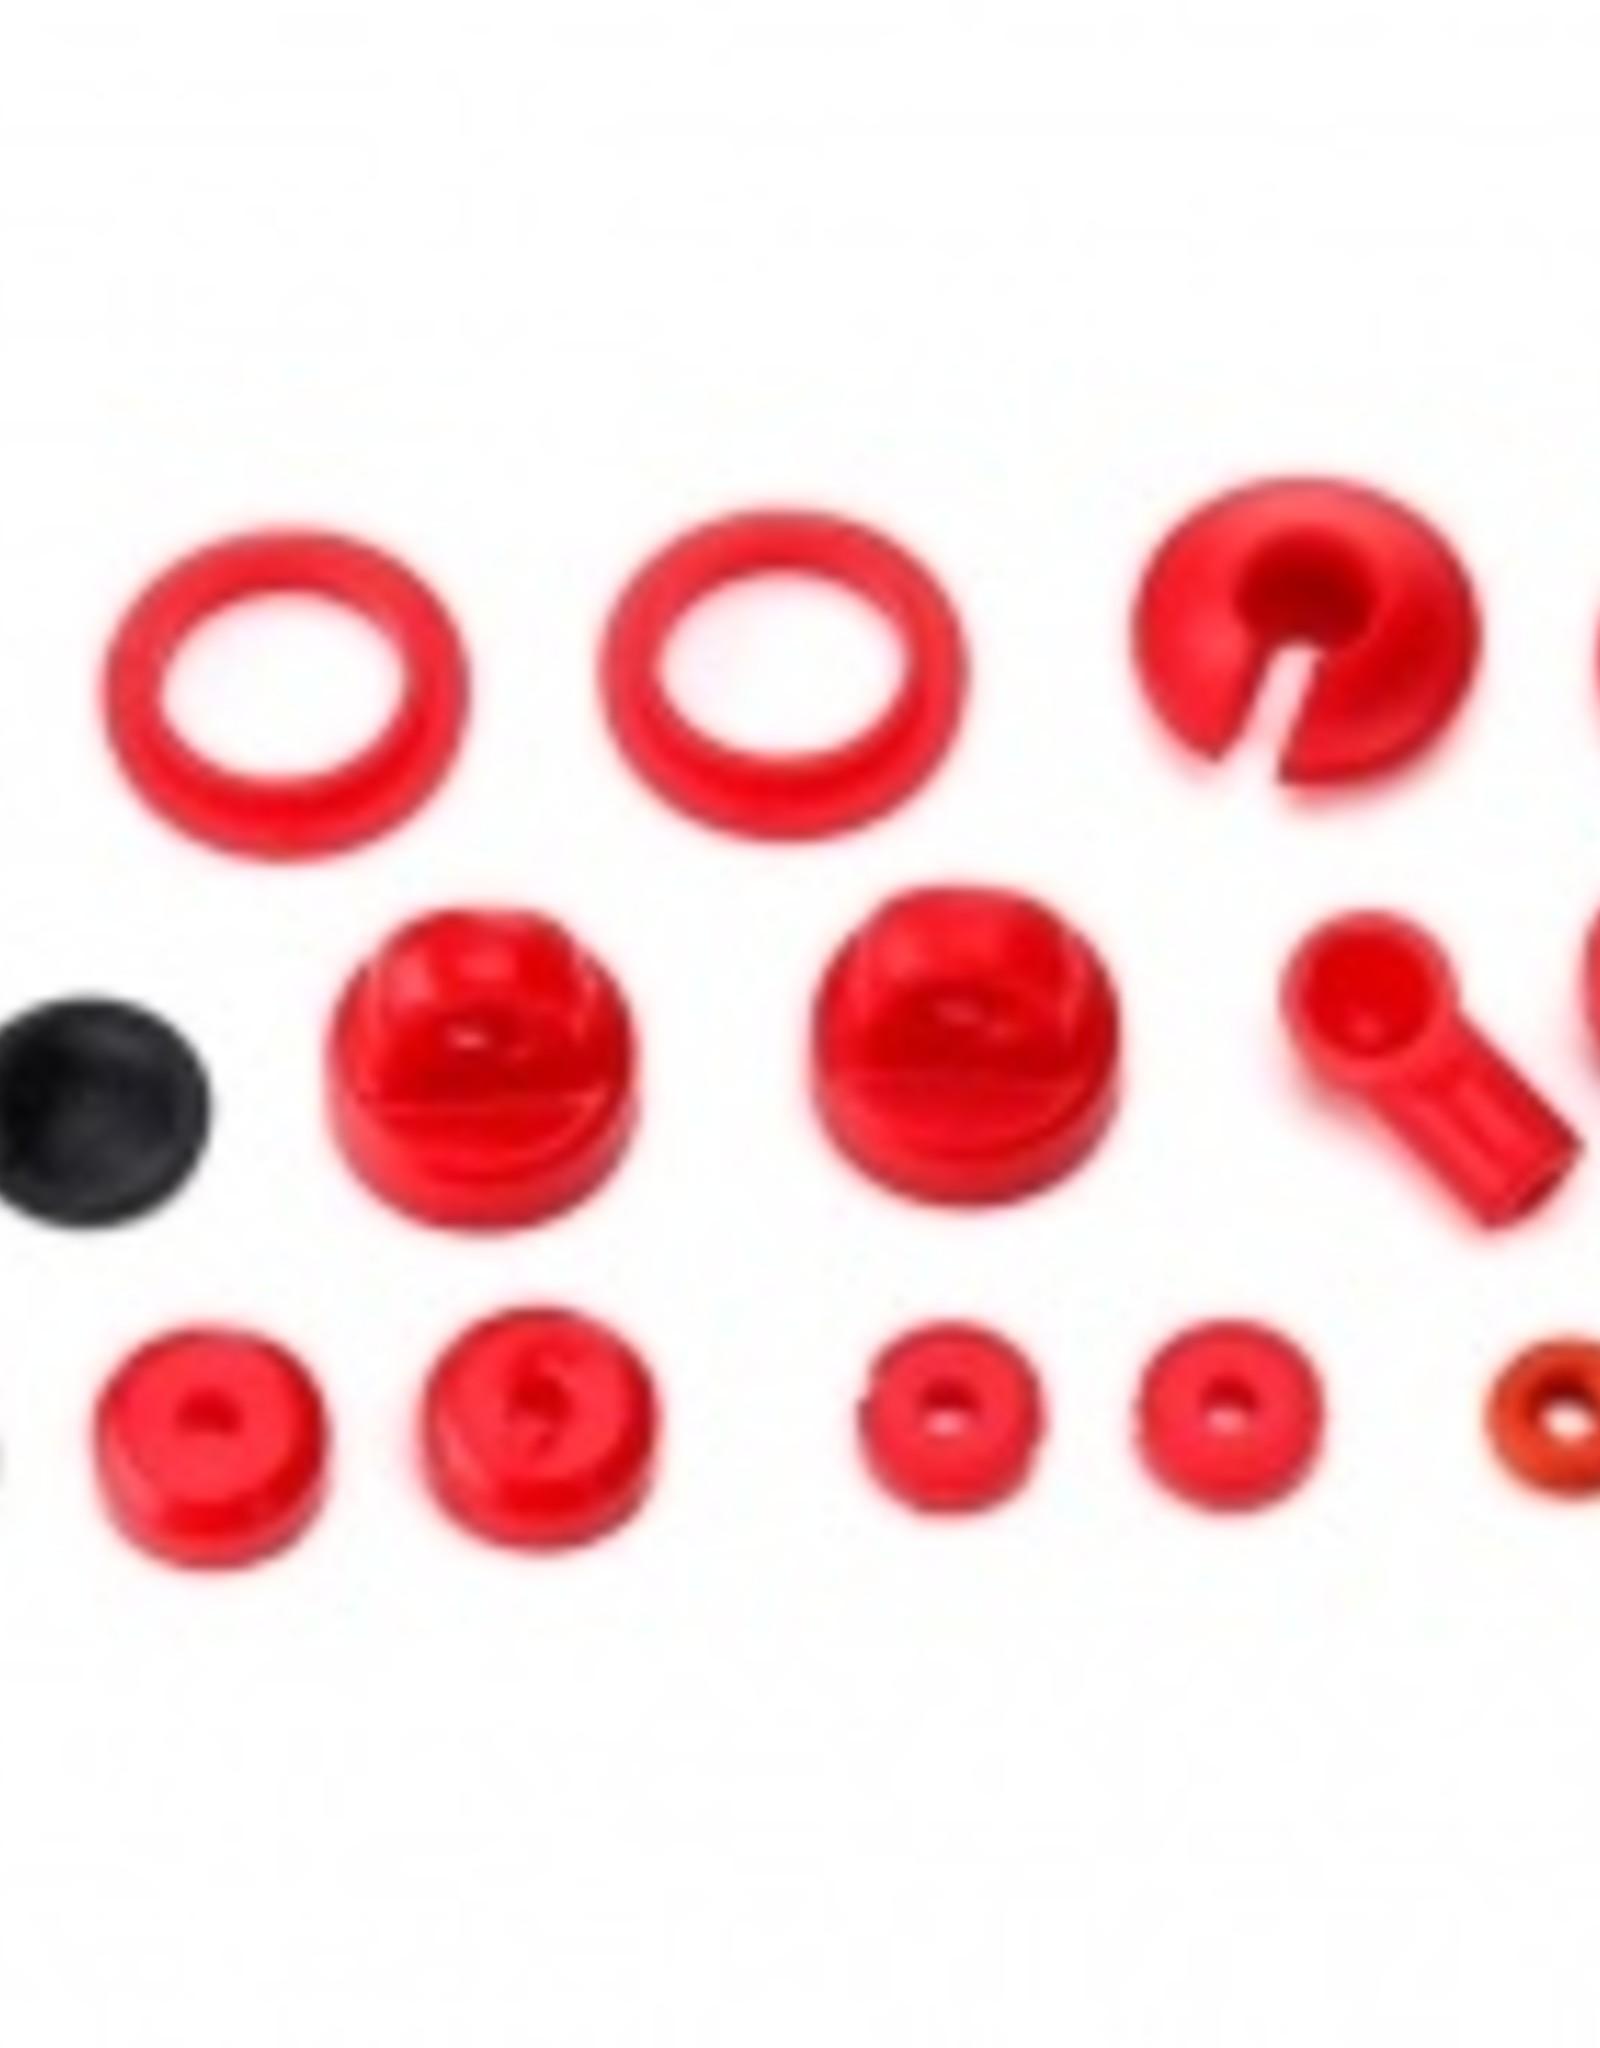 Traxxas LaTrax Teton/ SST Rebuild kit, oil-filled shocks (o-ring, bladder, piston, shaft guide, E-clips, shock cap, shock rod end) renews 2 shocks